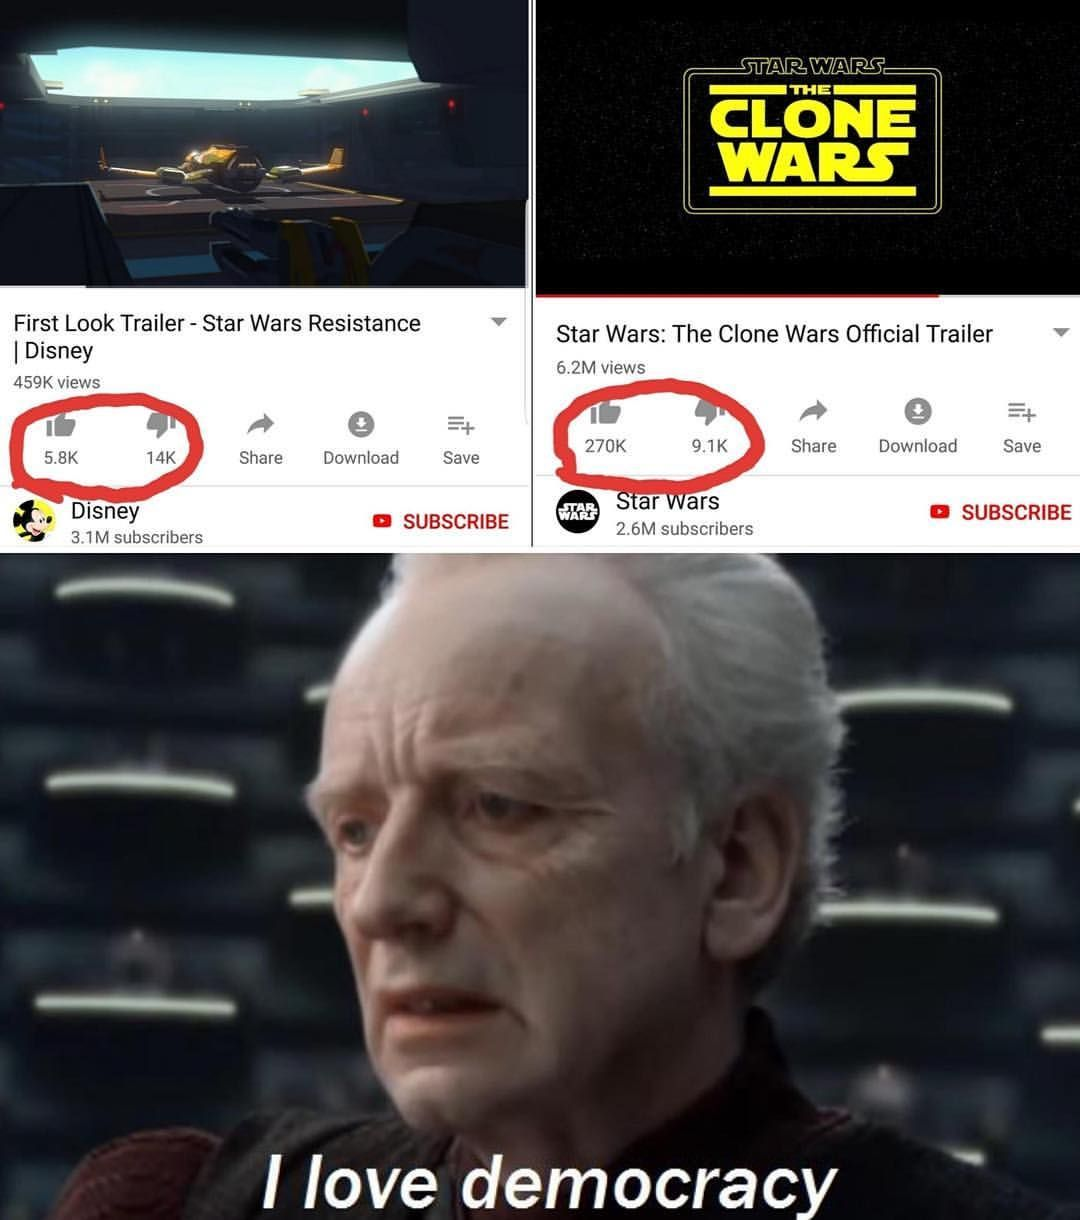 Star Wars Starwars Memes Prequel Memes Starwarsthelastjedi Funny Star Wars Memes Star Wars Humor Star Wars Facts